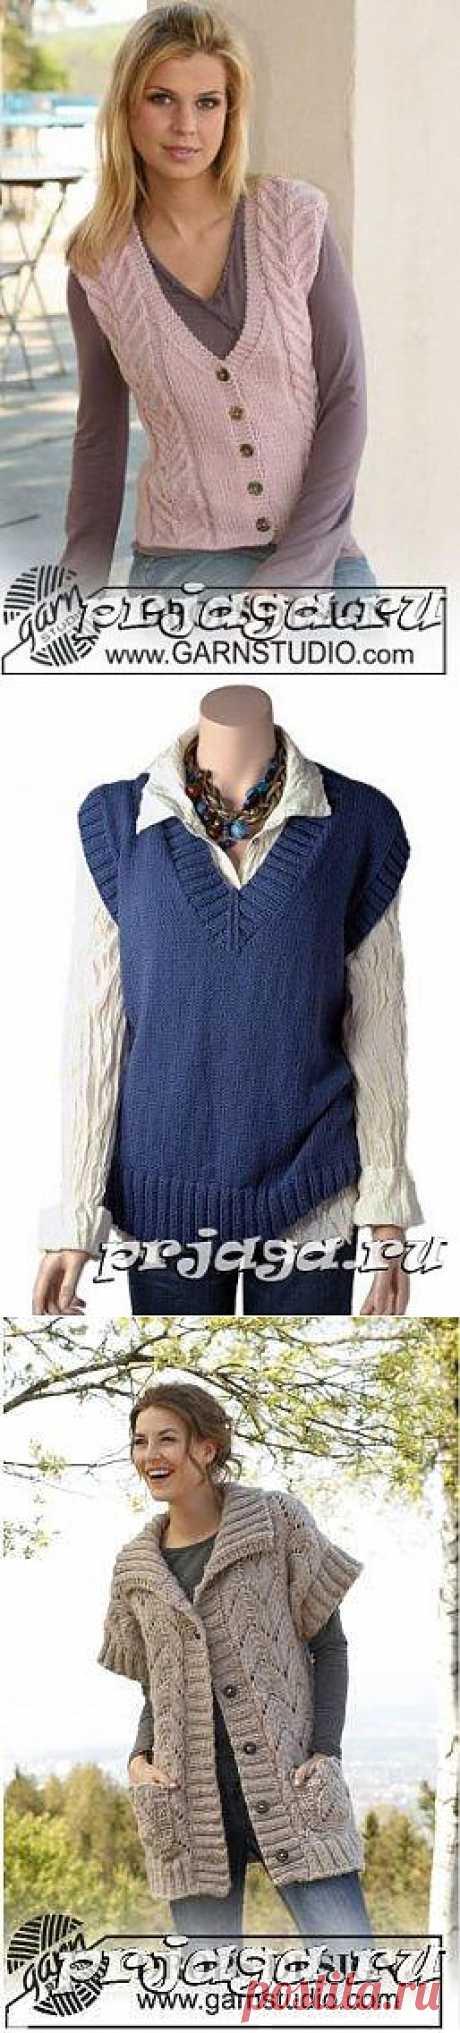 Women's sleeveless jacket and vest hook or spokes